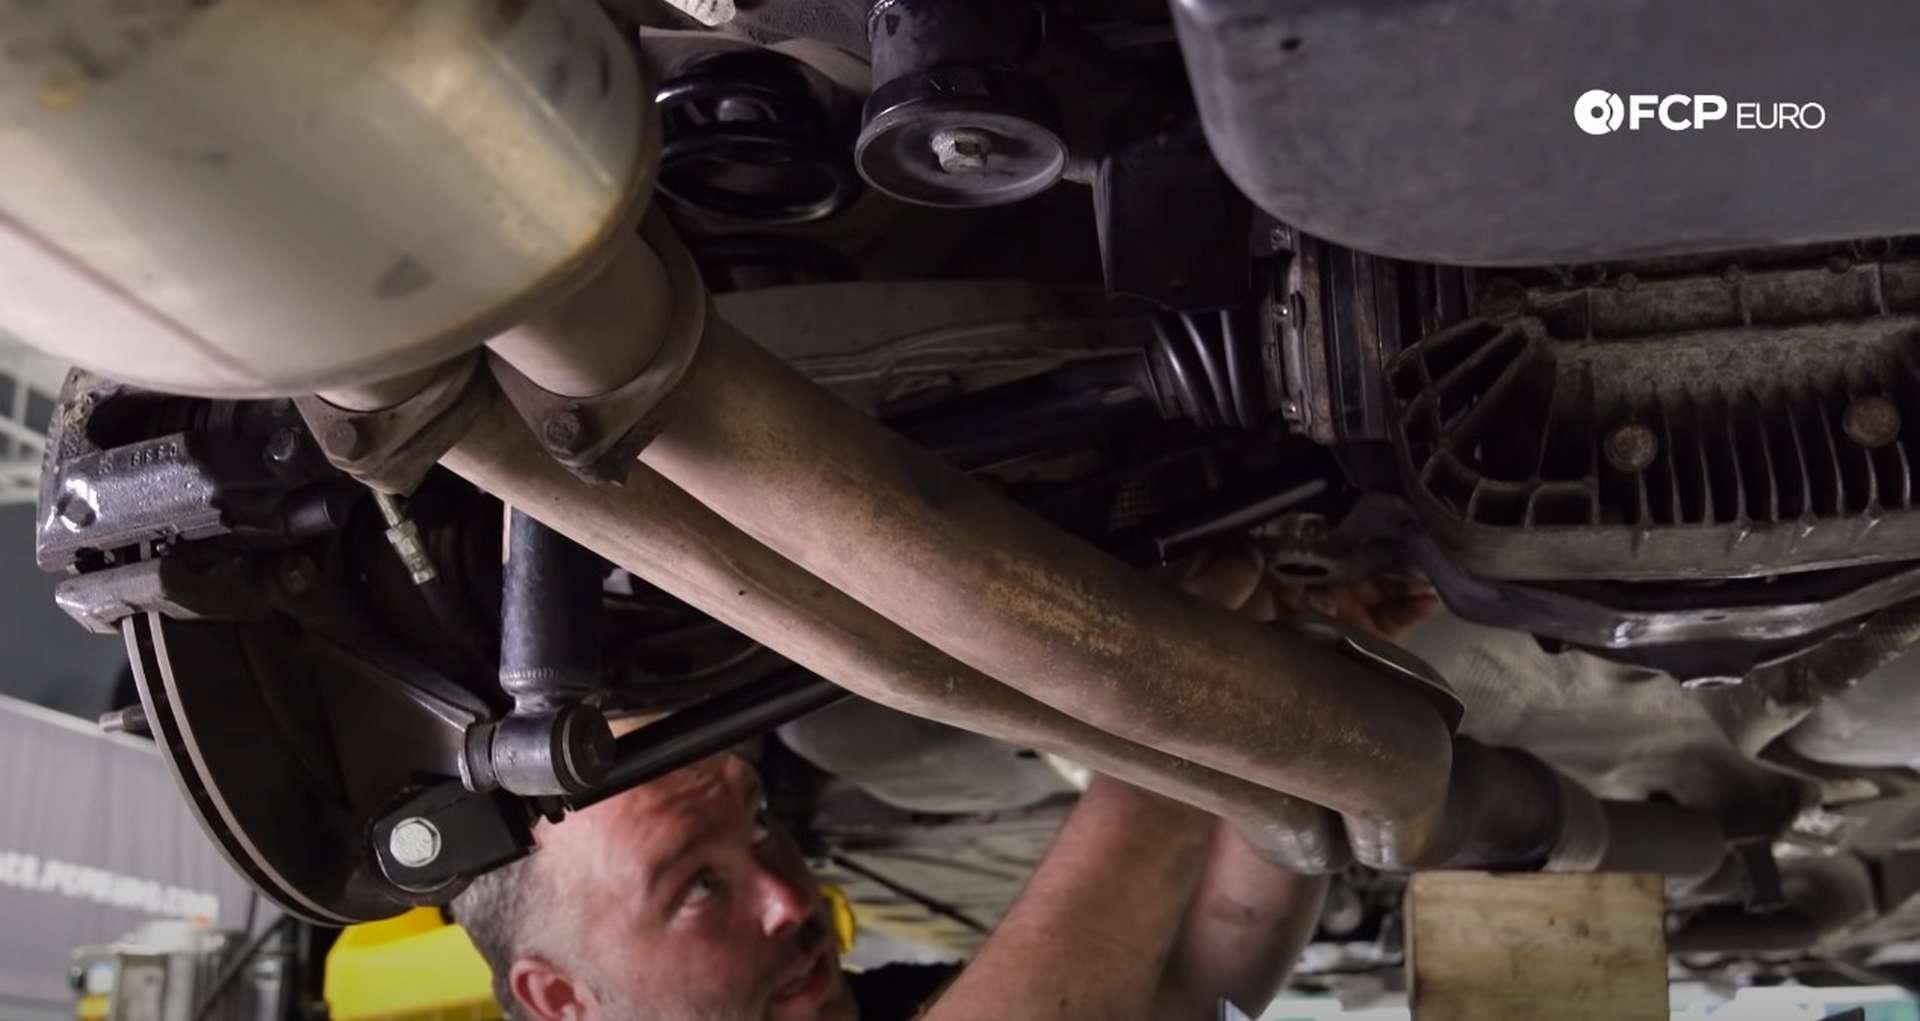 DIY E46 BMW M3 Rear Subframe Refresh Part 3 installing the subframe mount heat shield